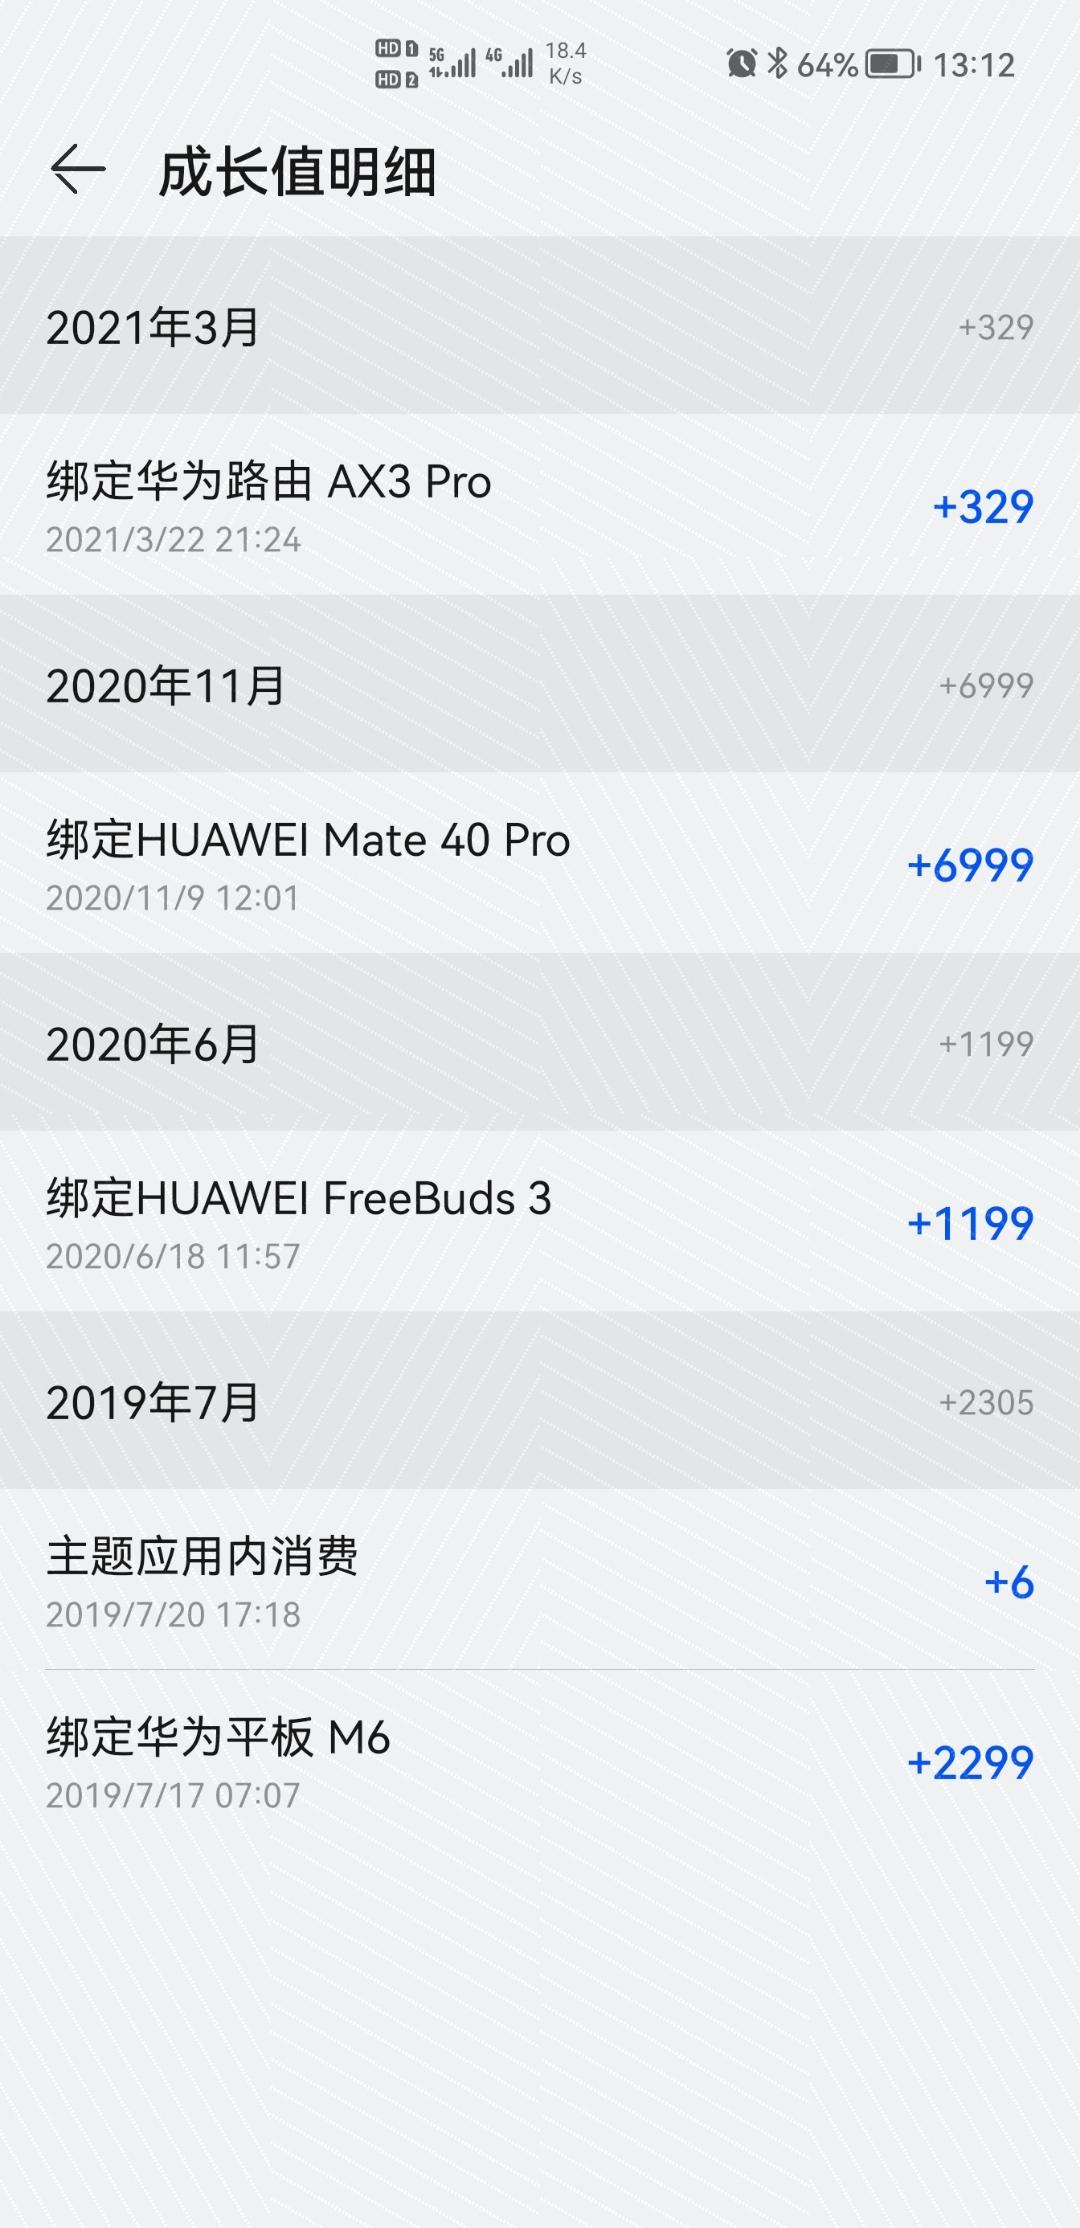 Screenshot_20210517_131259_com.huawei.mycenter.jpg